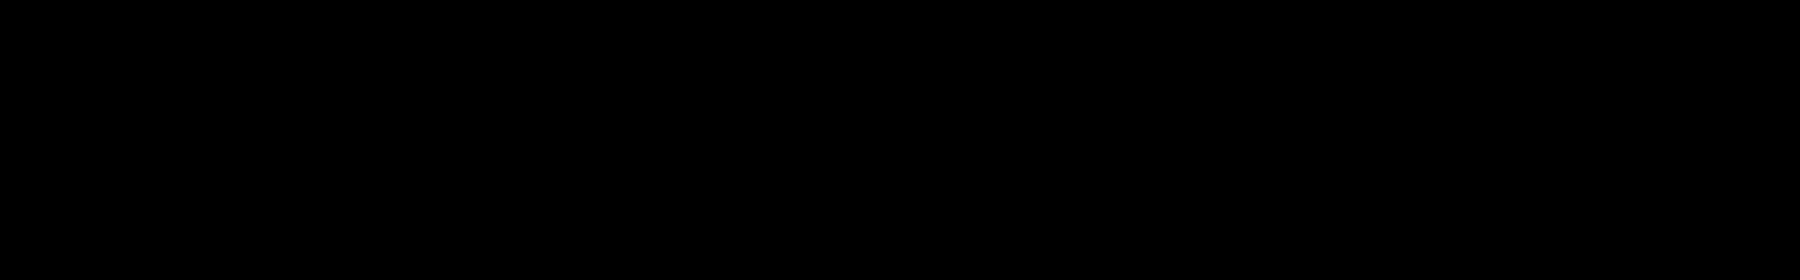 Dubstep Mantis audio waveform